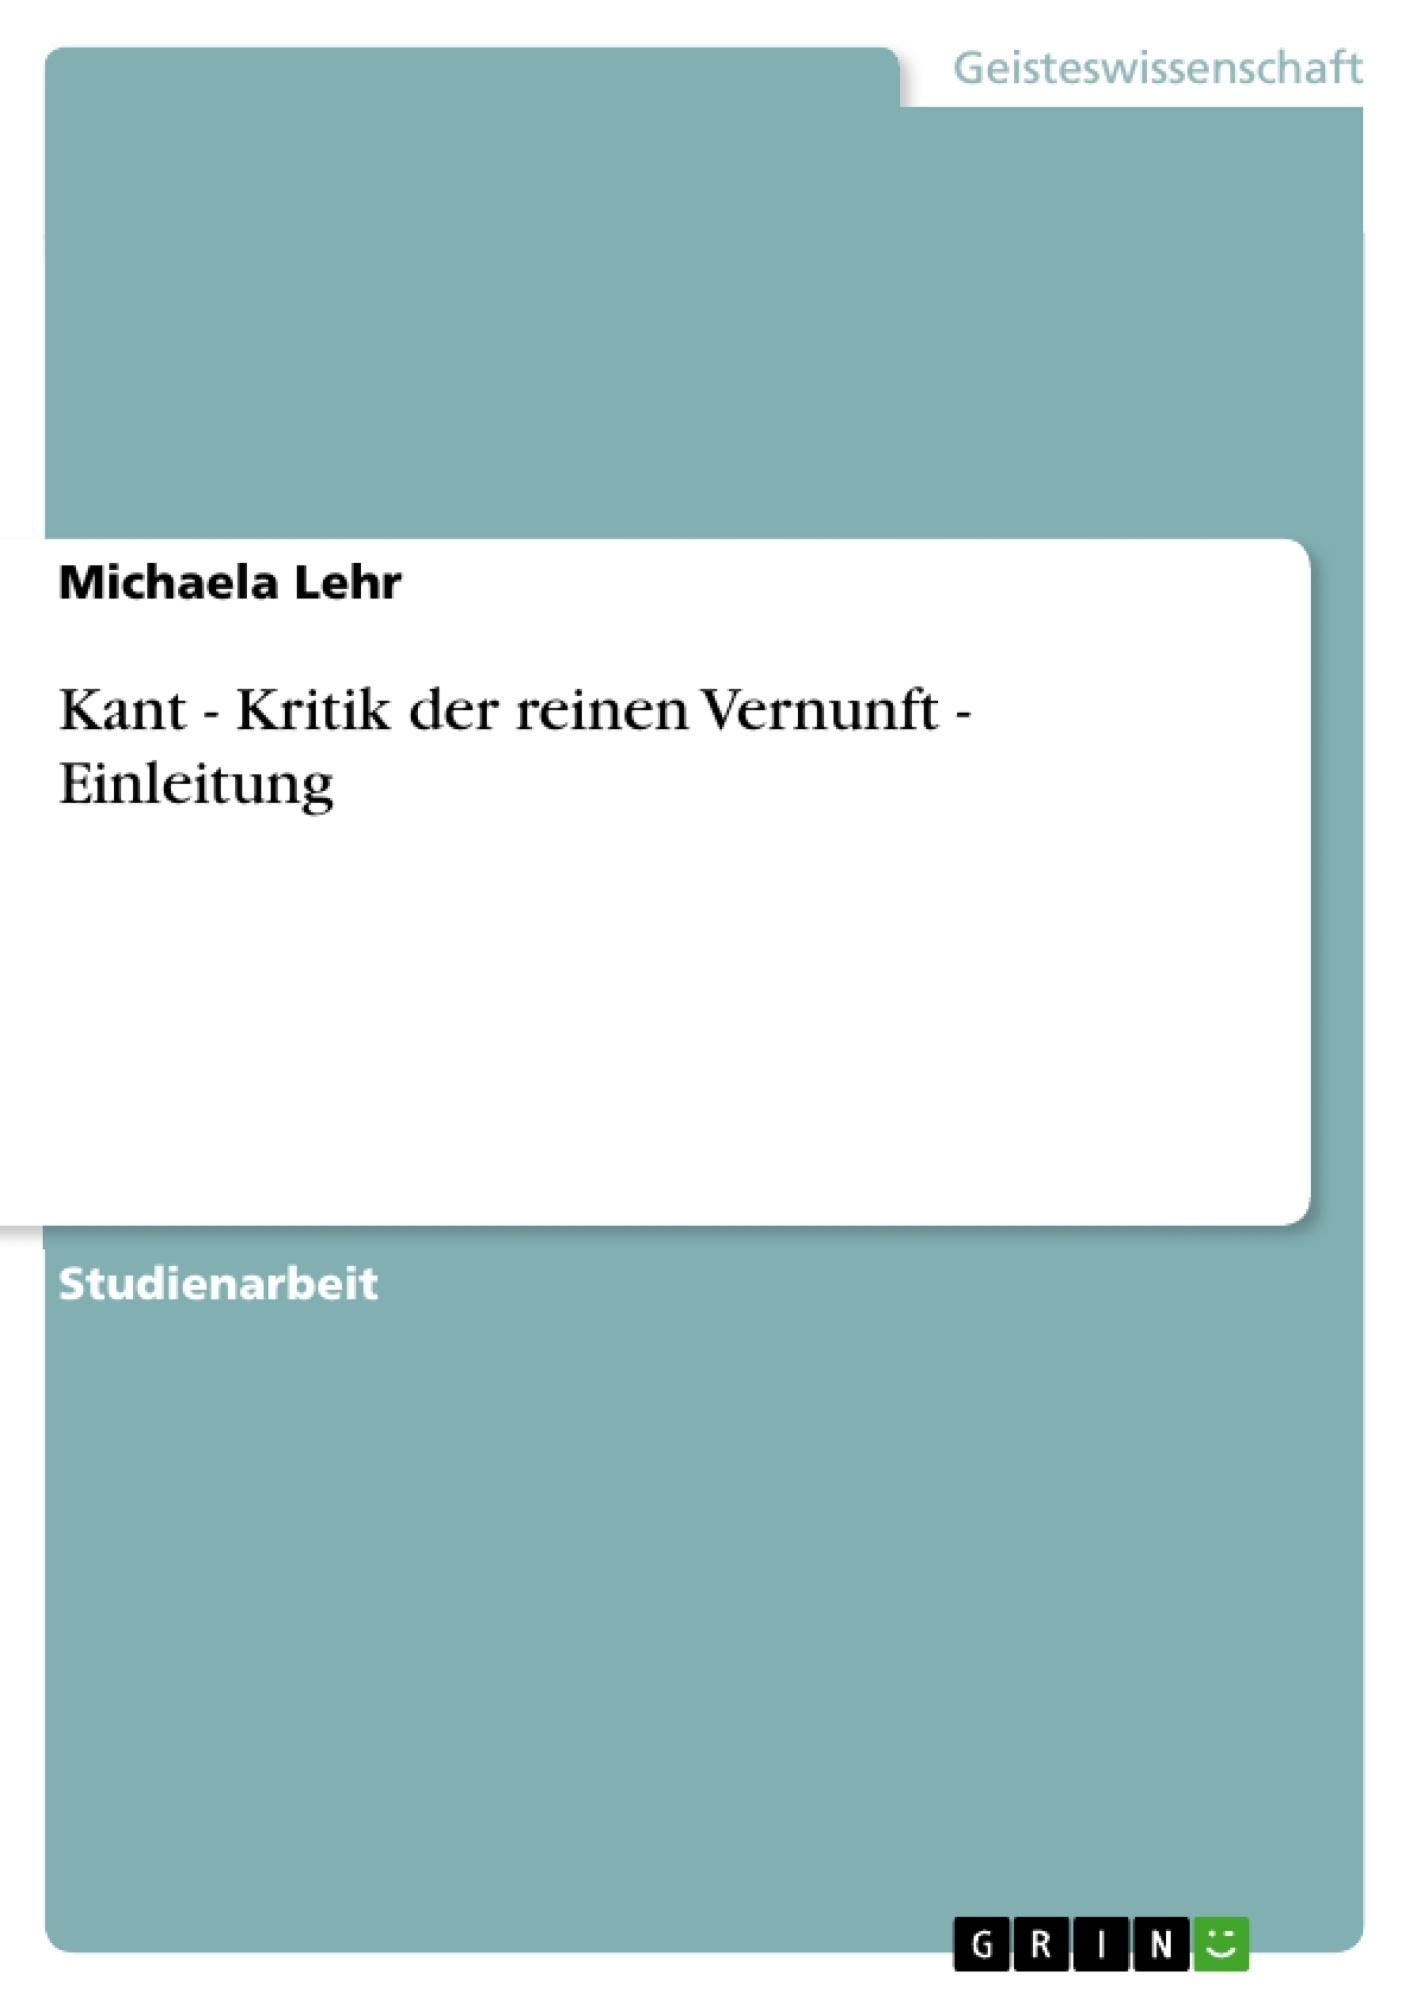 Titel: Kant - Kritik der reinen Vernunft - Einleitung